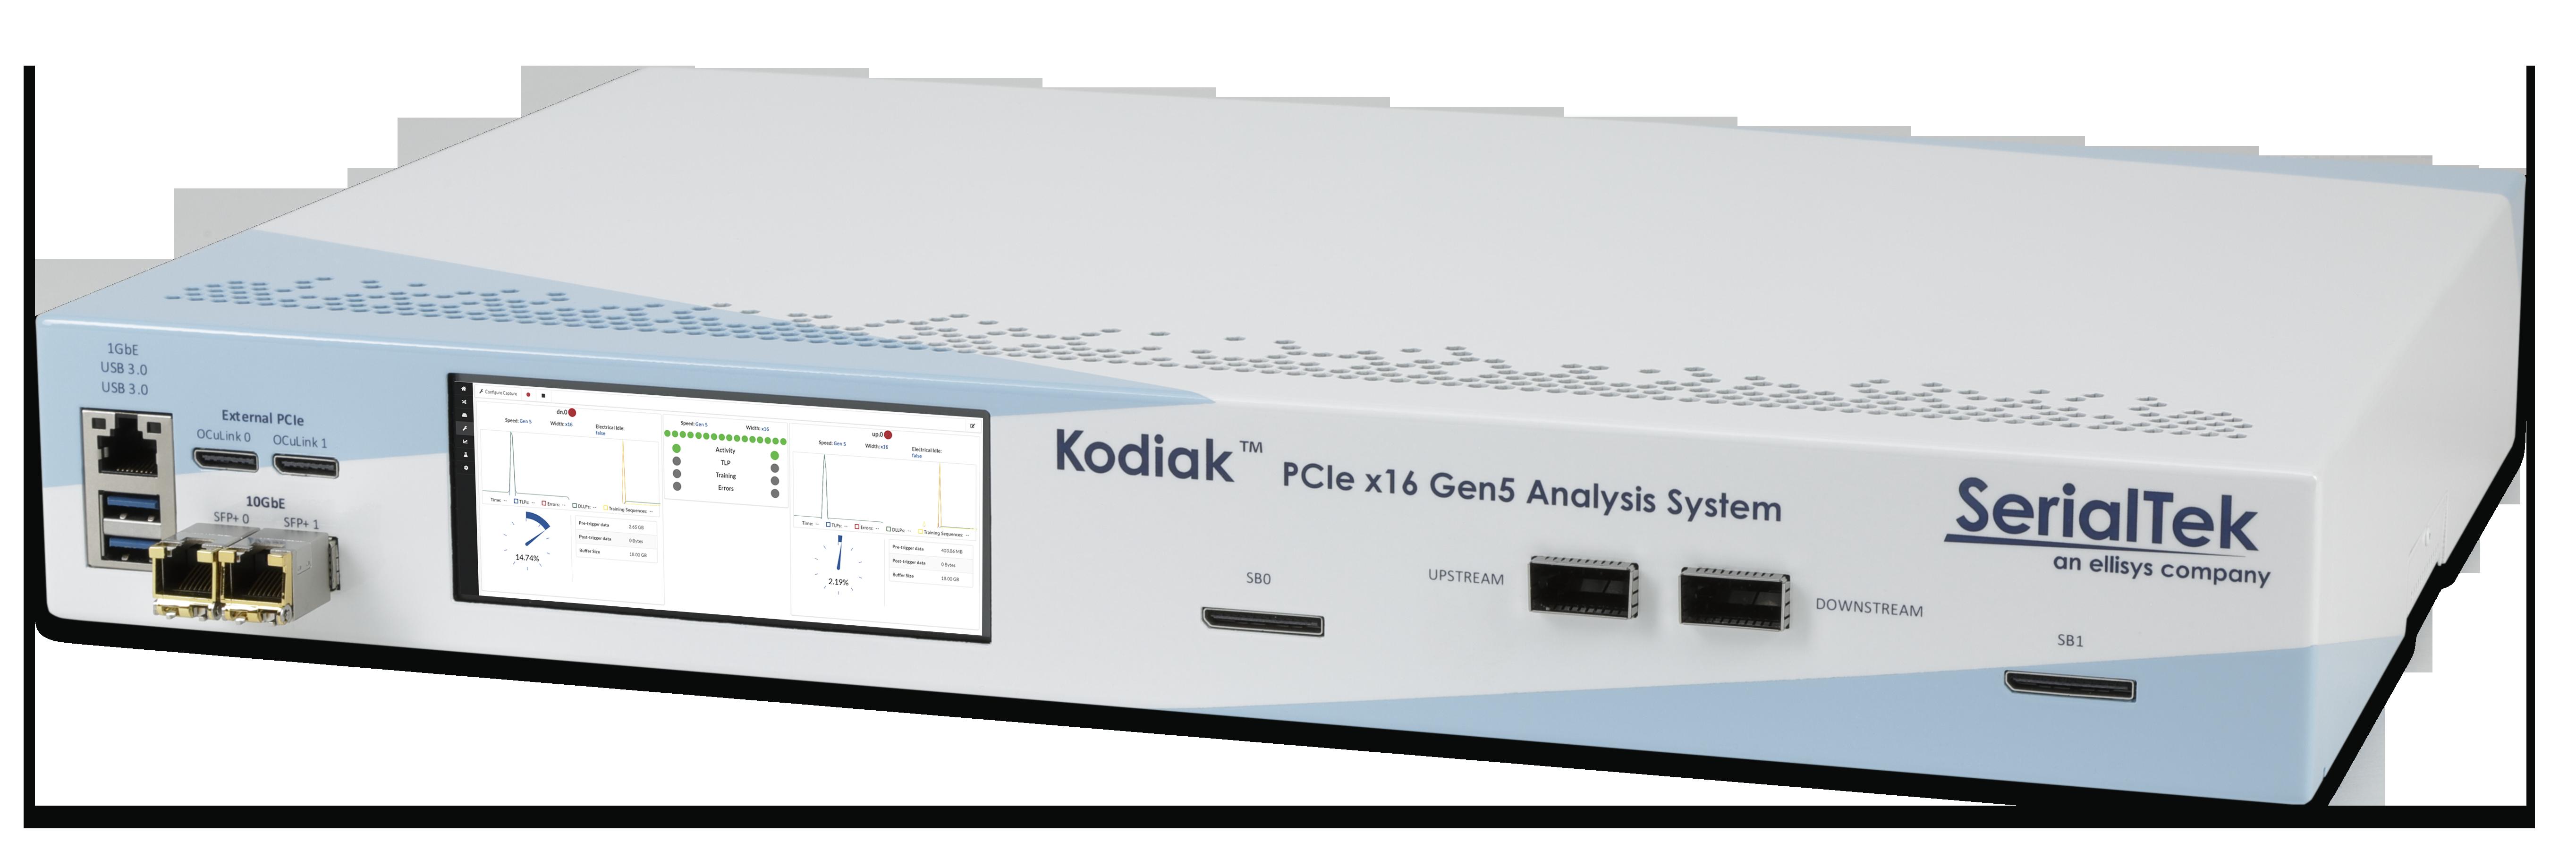 Kodiak Gen5 Analysis System